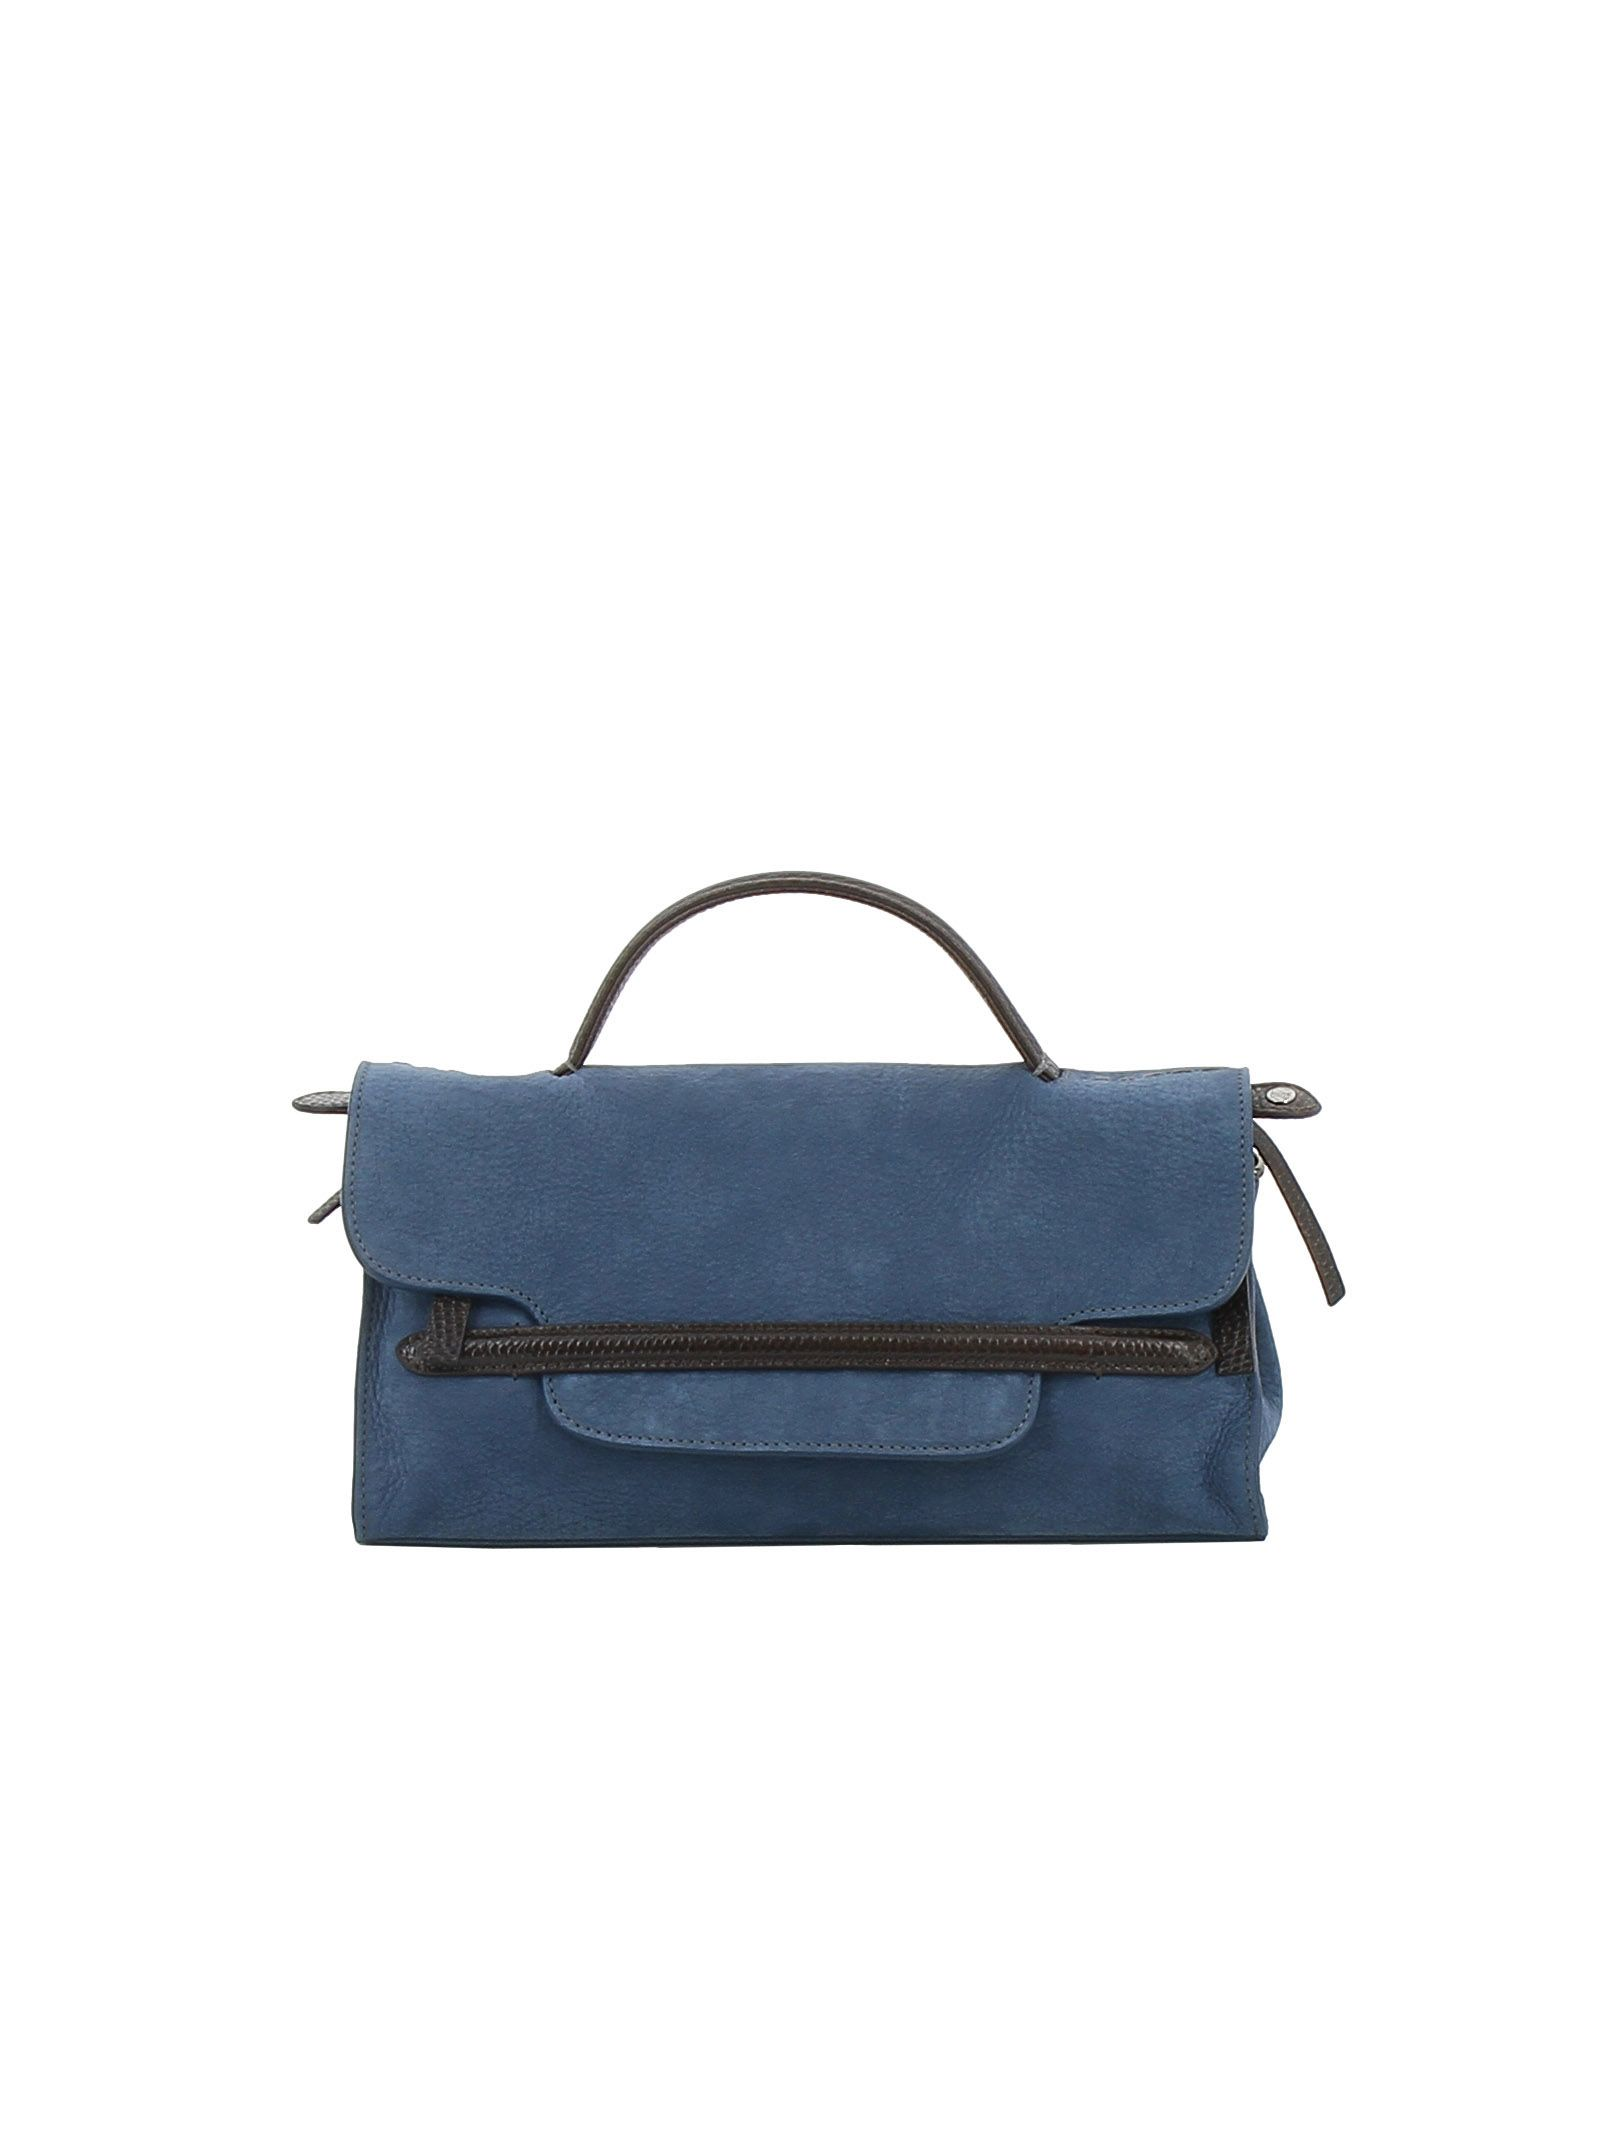 Zanellato Nina S Jones Shoulder Bag